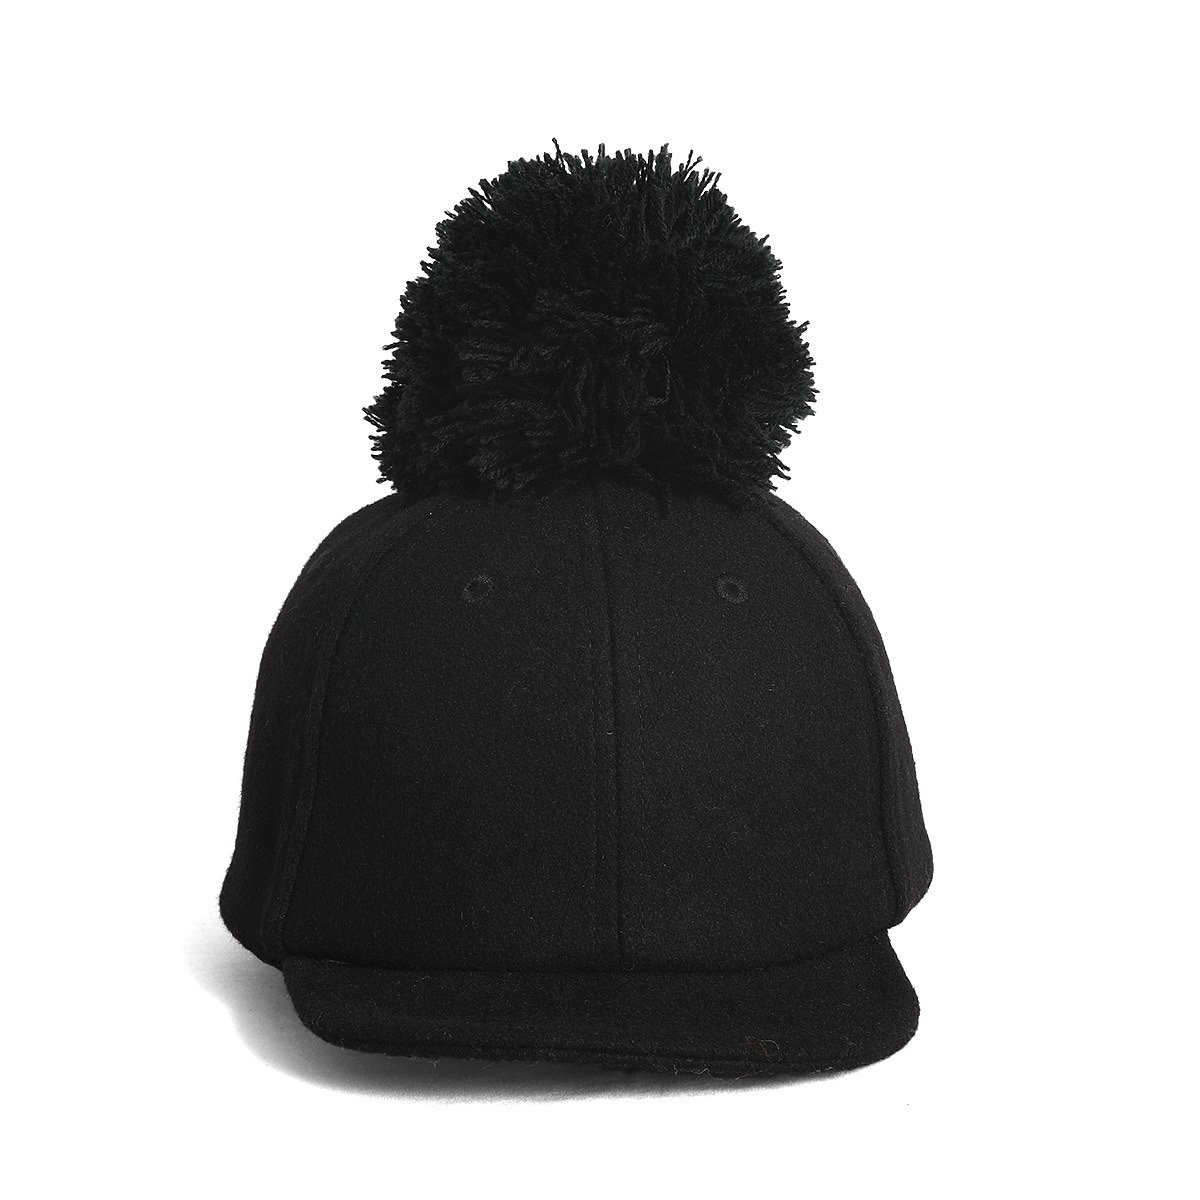 【KIDS】Wool Pom Cap 2 詳細画像1